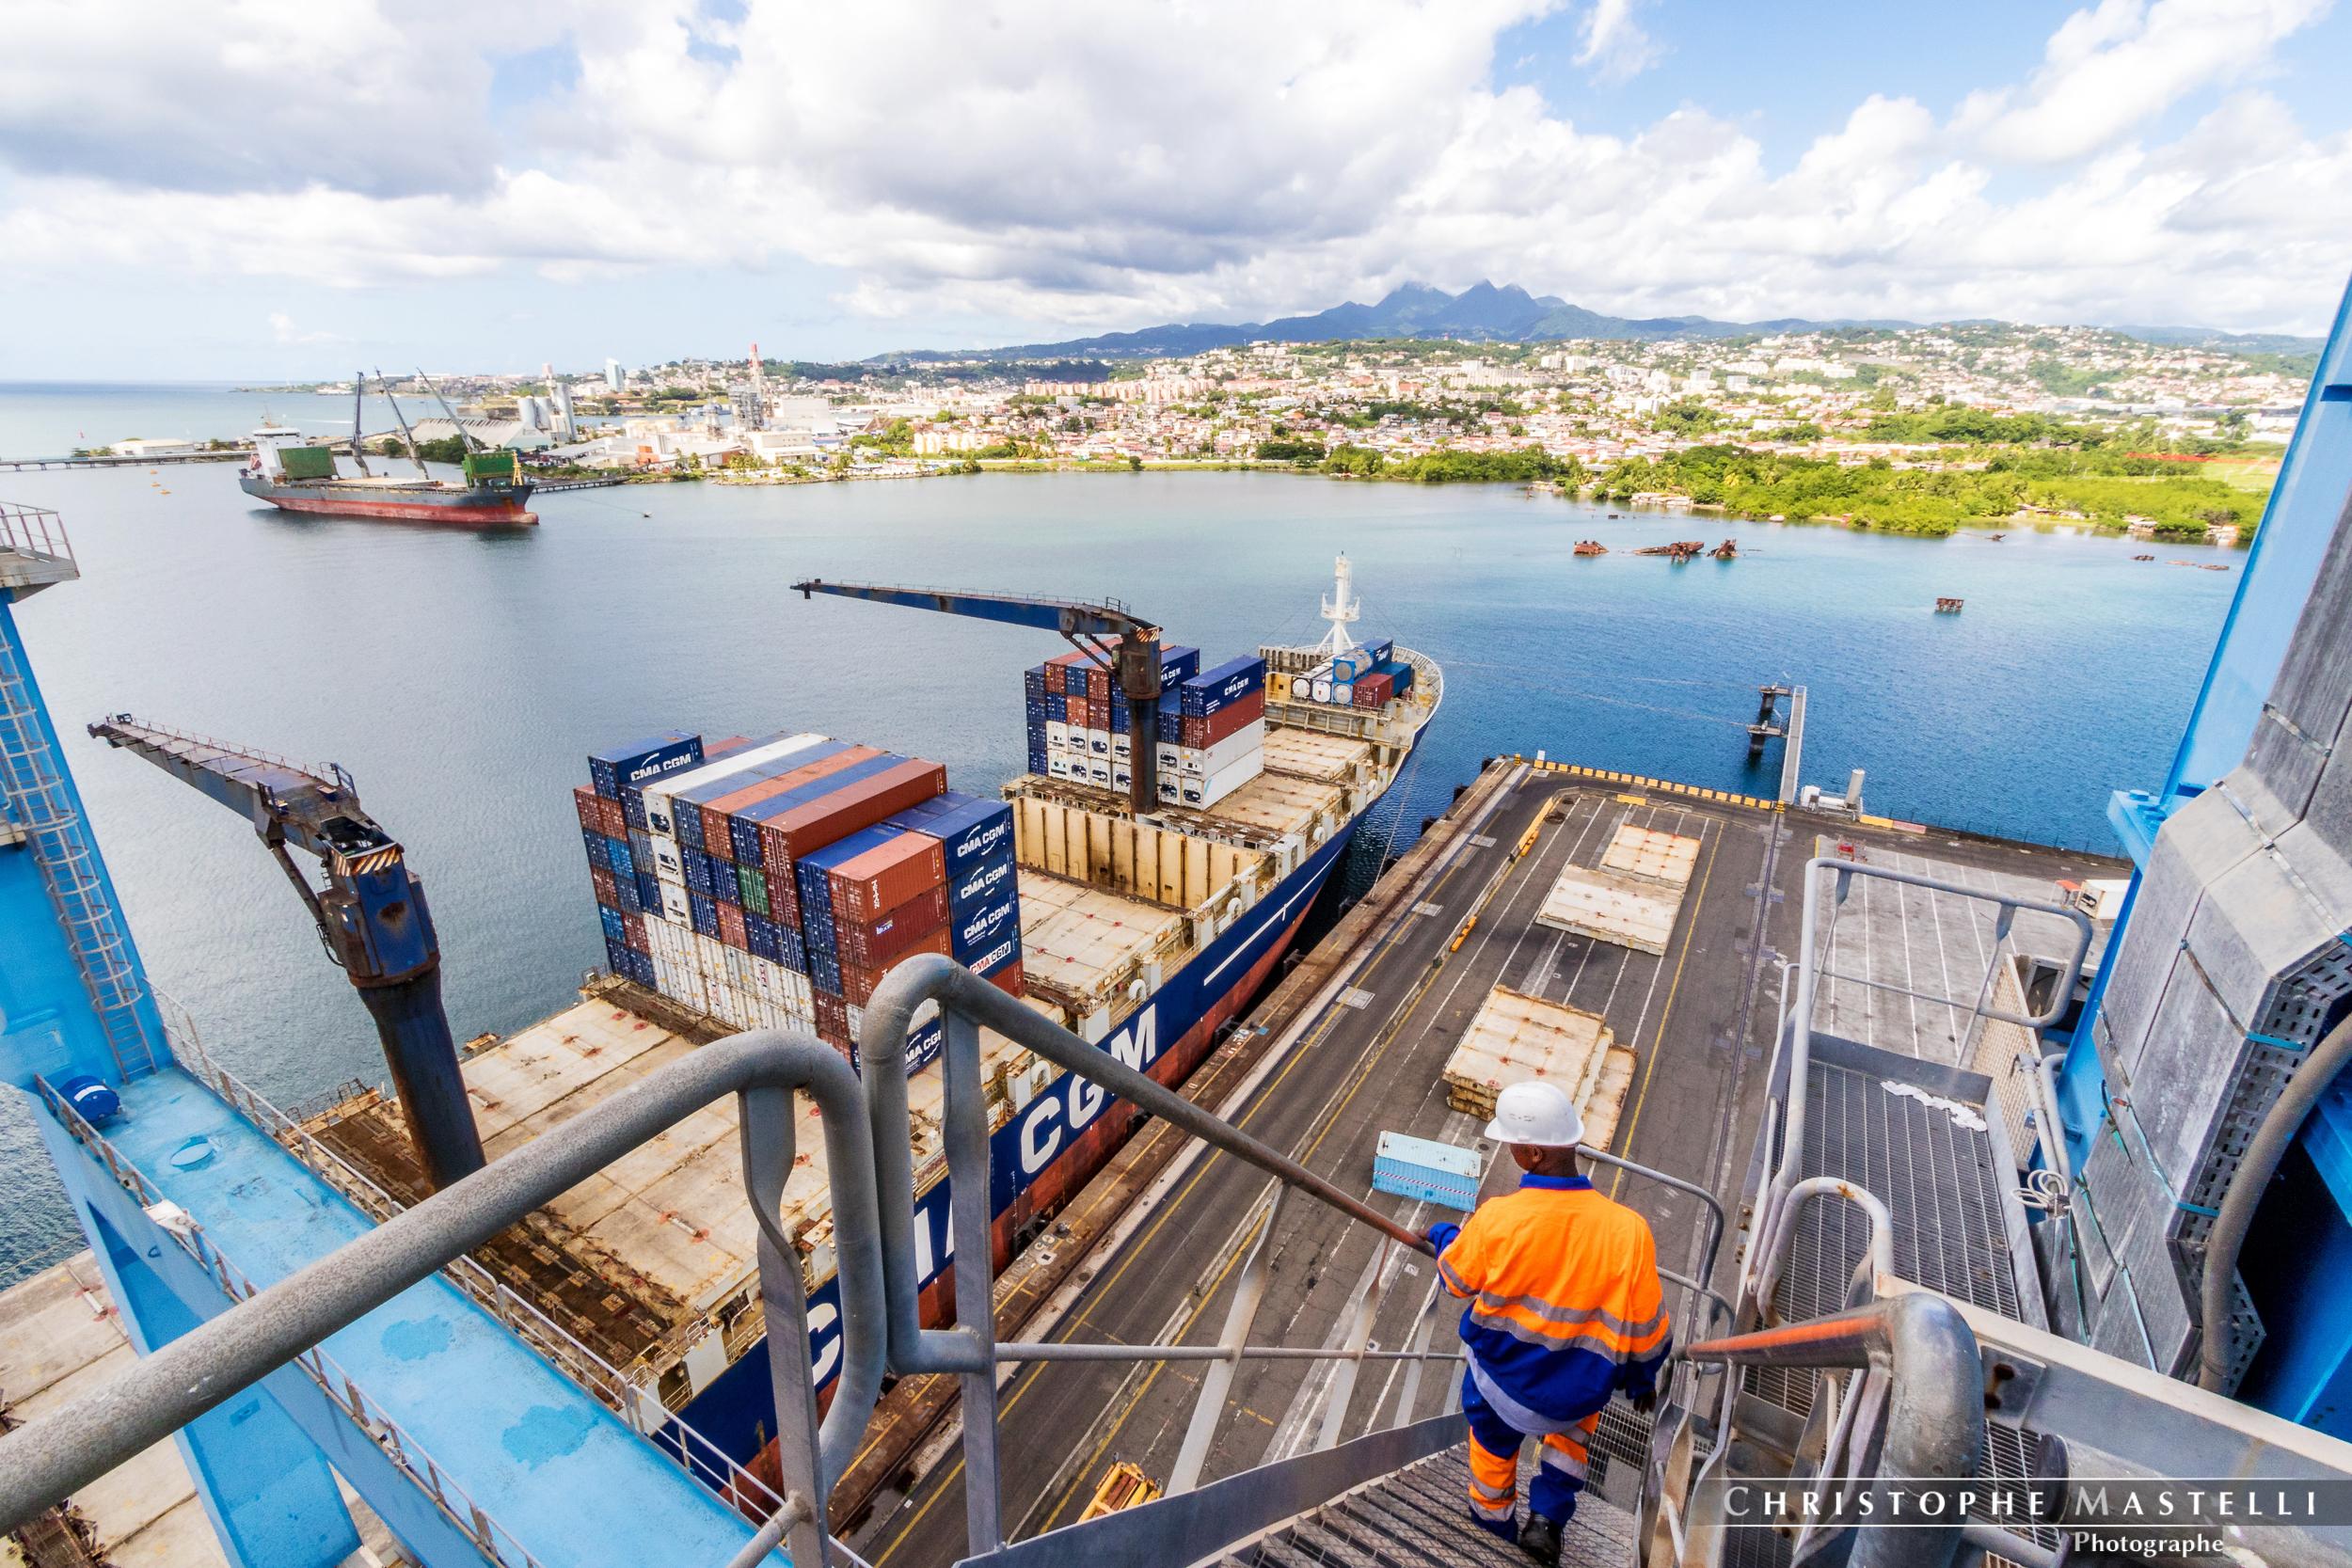 grands-ports-reportage-communication-photographe-christophe-mastelli-region-paca